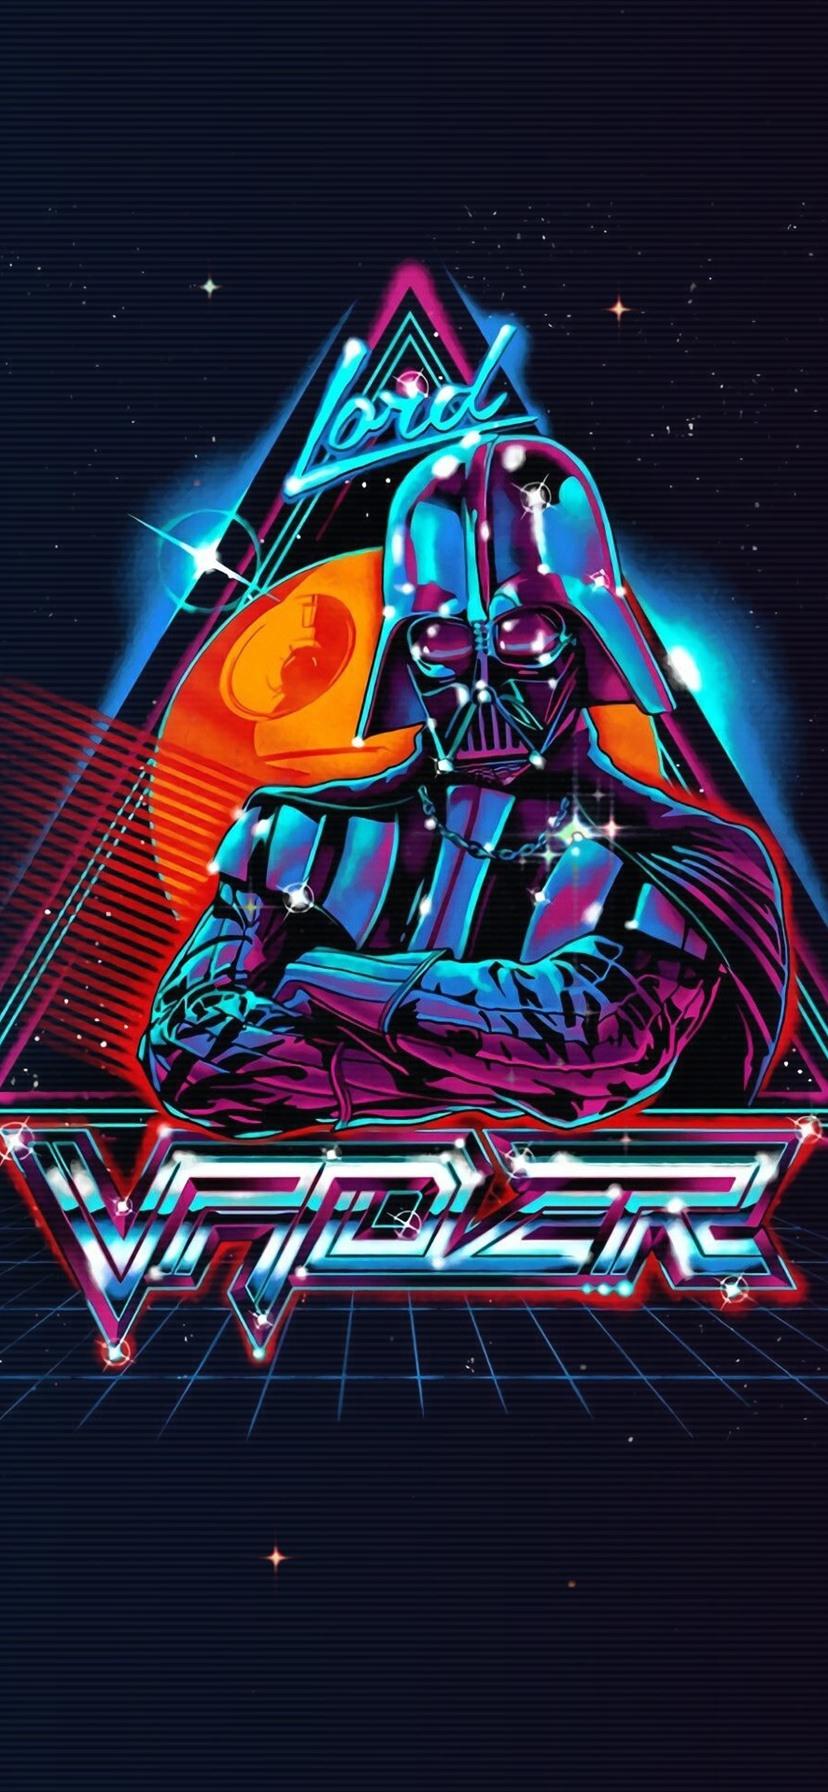 Star Wars Darth Vader art picture black